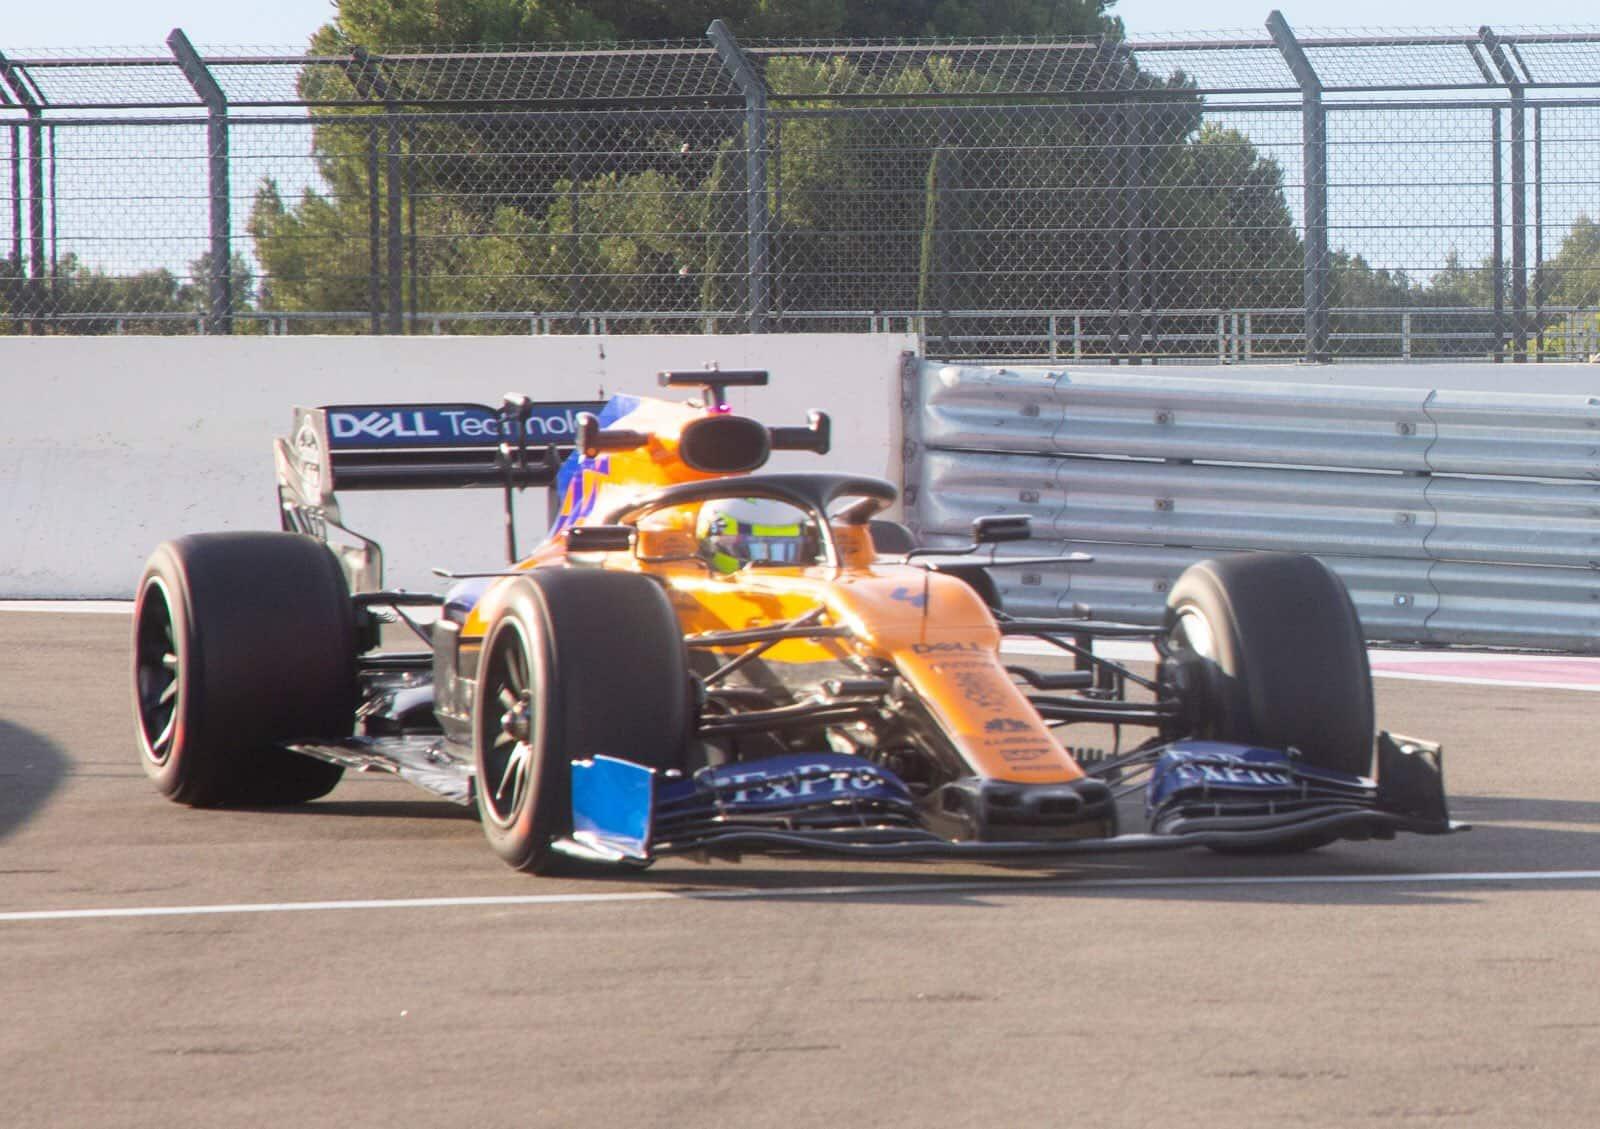 McLaren MCL34 Pirelli F1 18 inch tyres test Photo McLaren Twitter